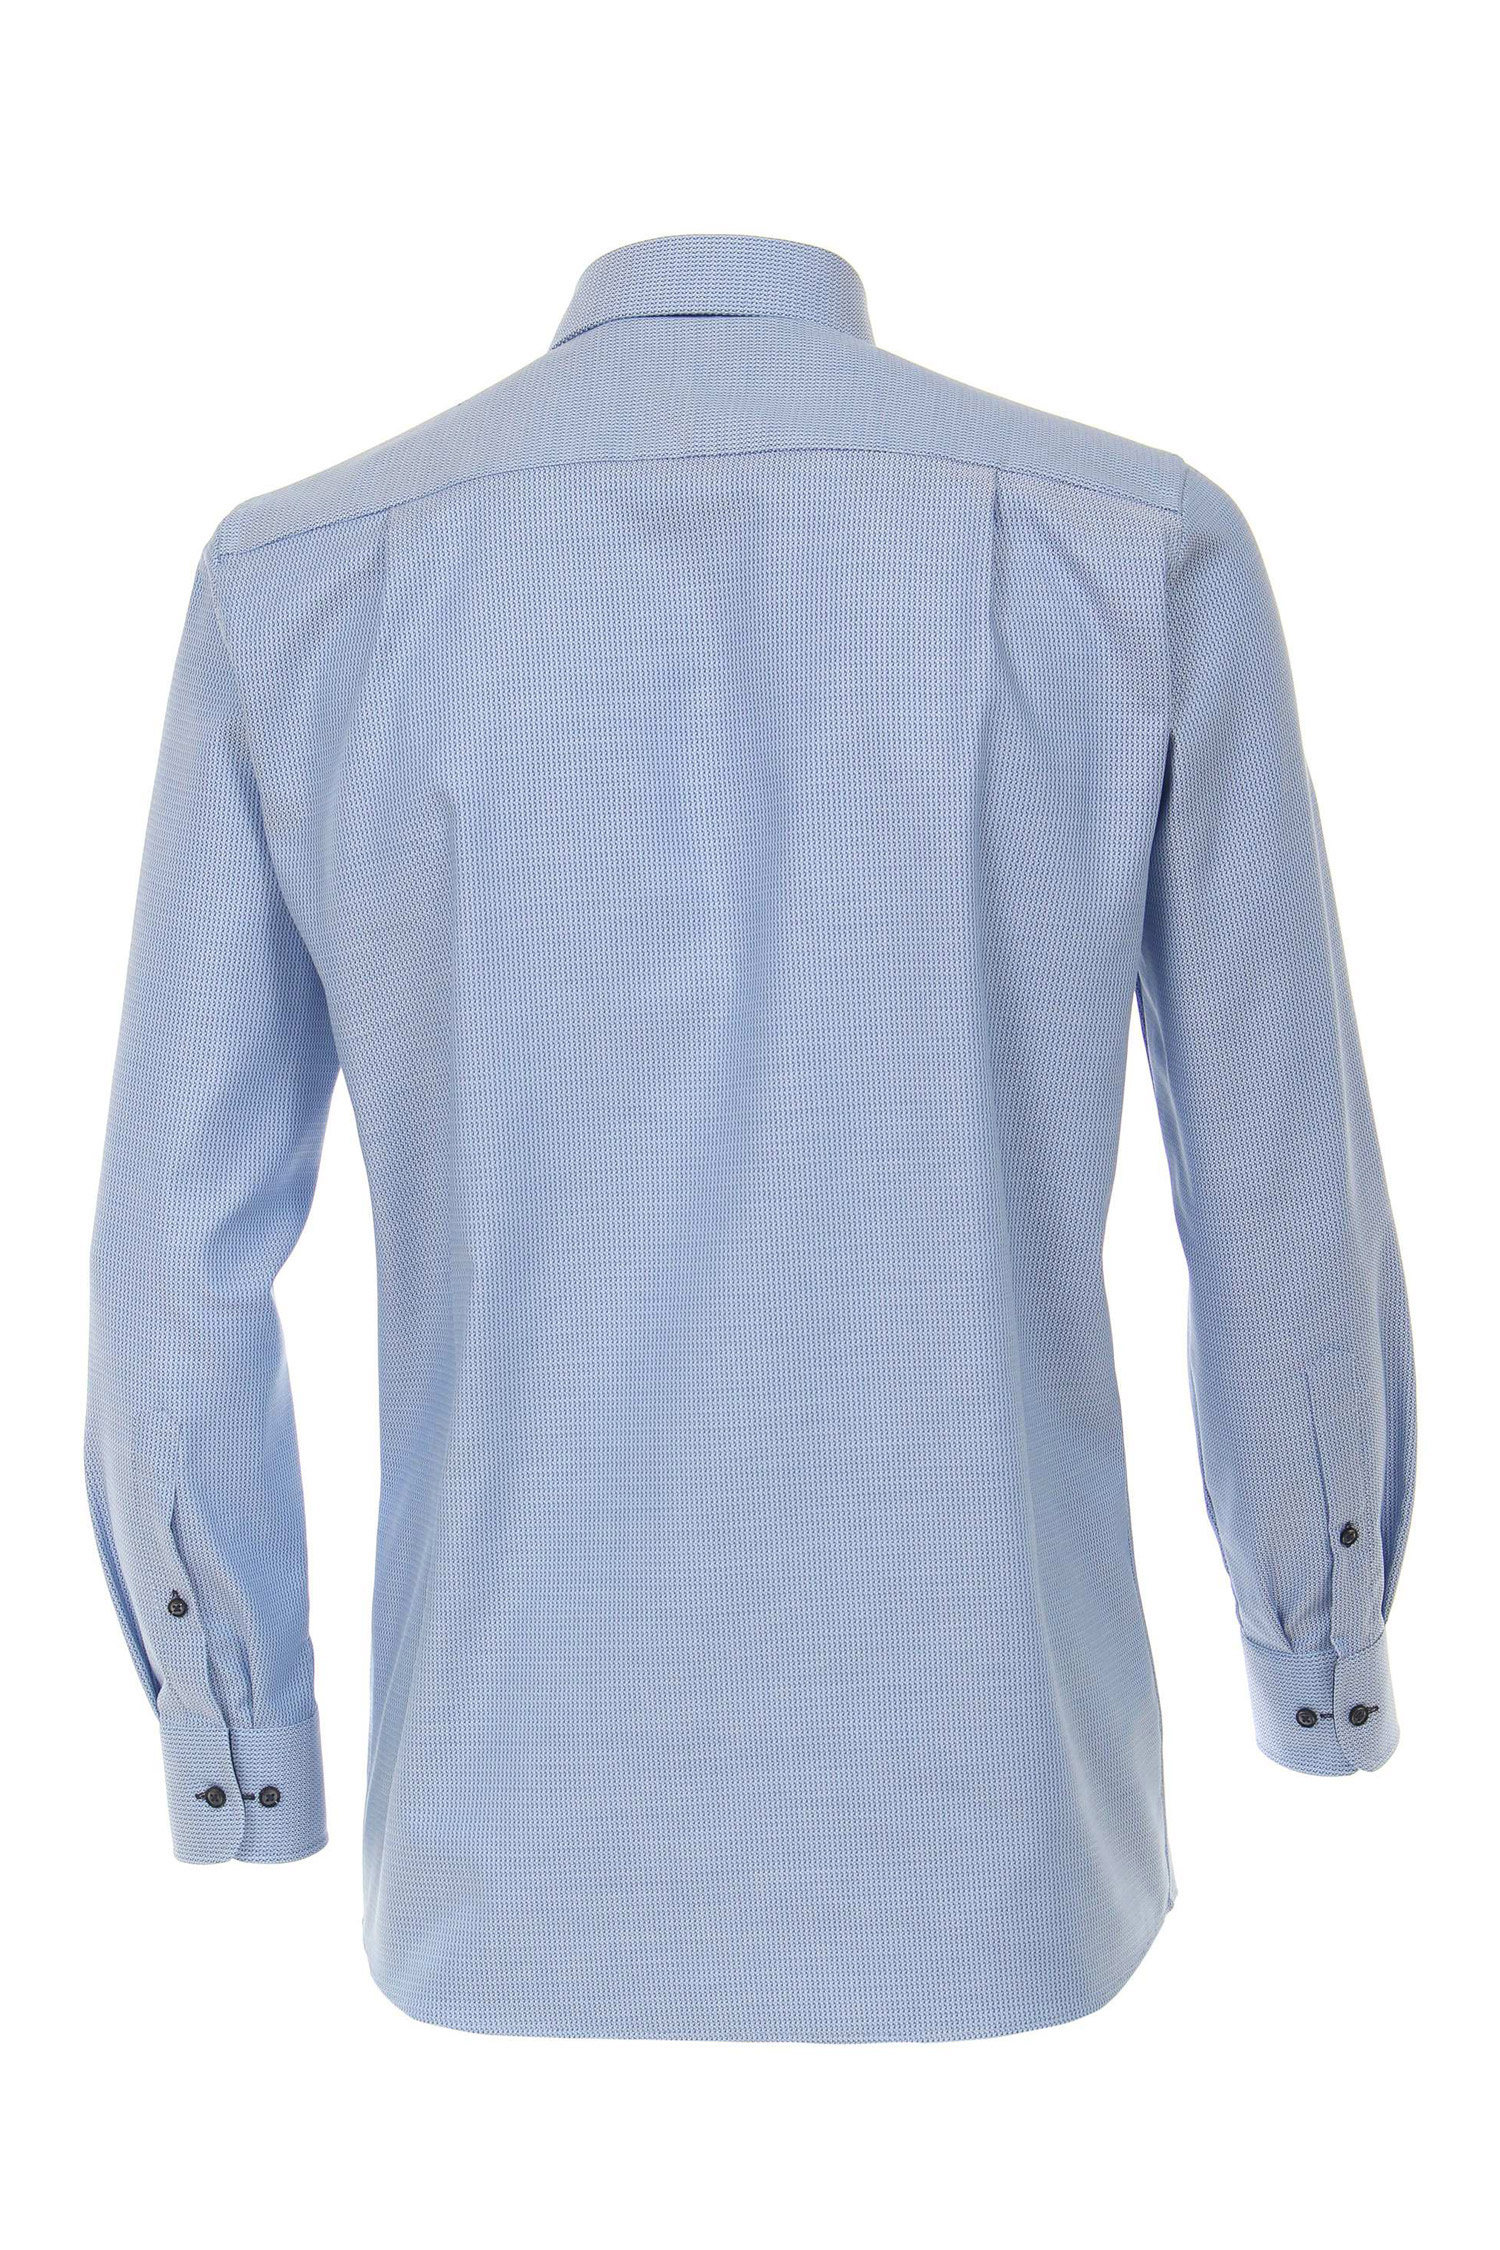 Camisas, Vestir Manga Larga, 110555, CELESTE | Zoom